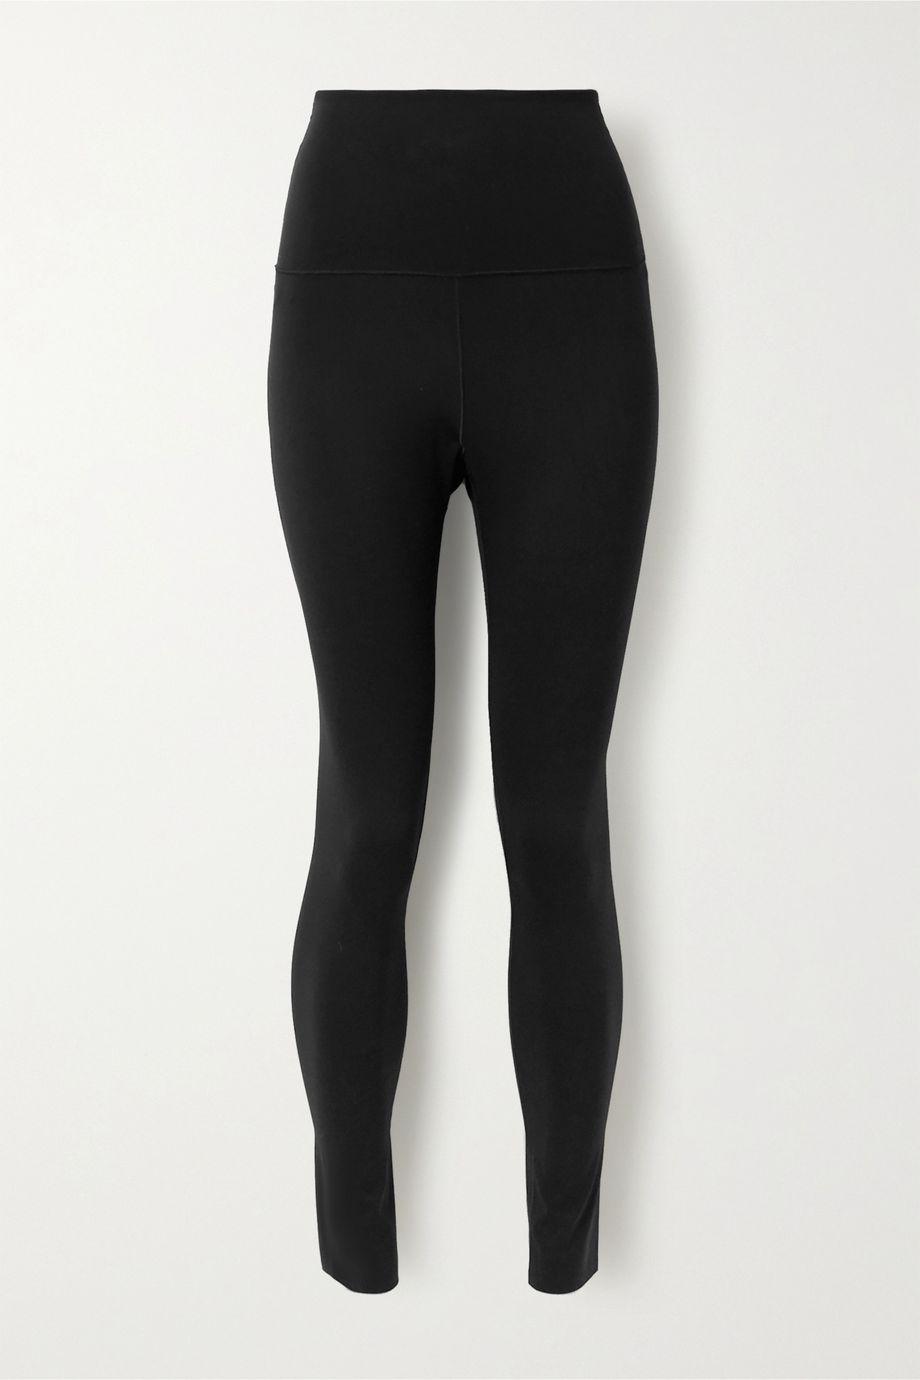 WONE Contour stretch leggings